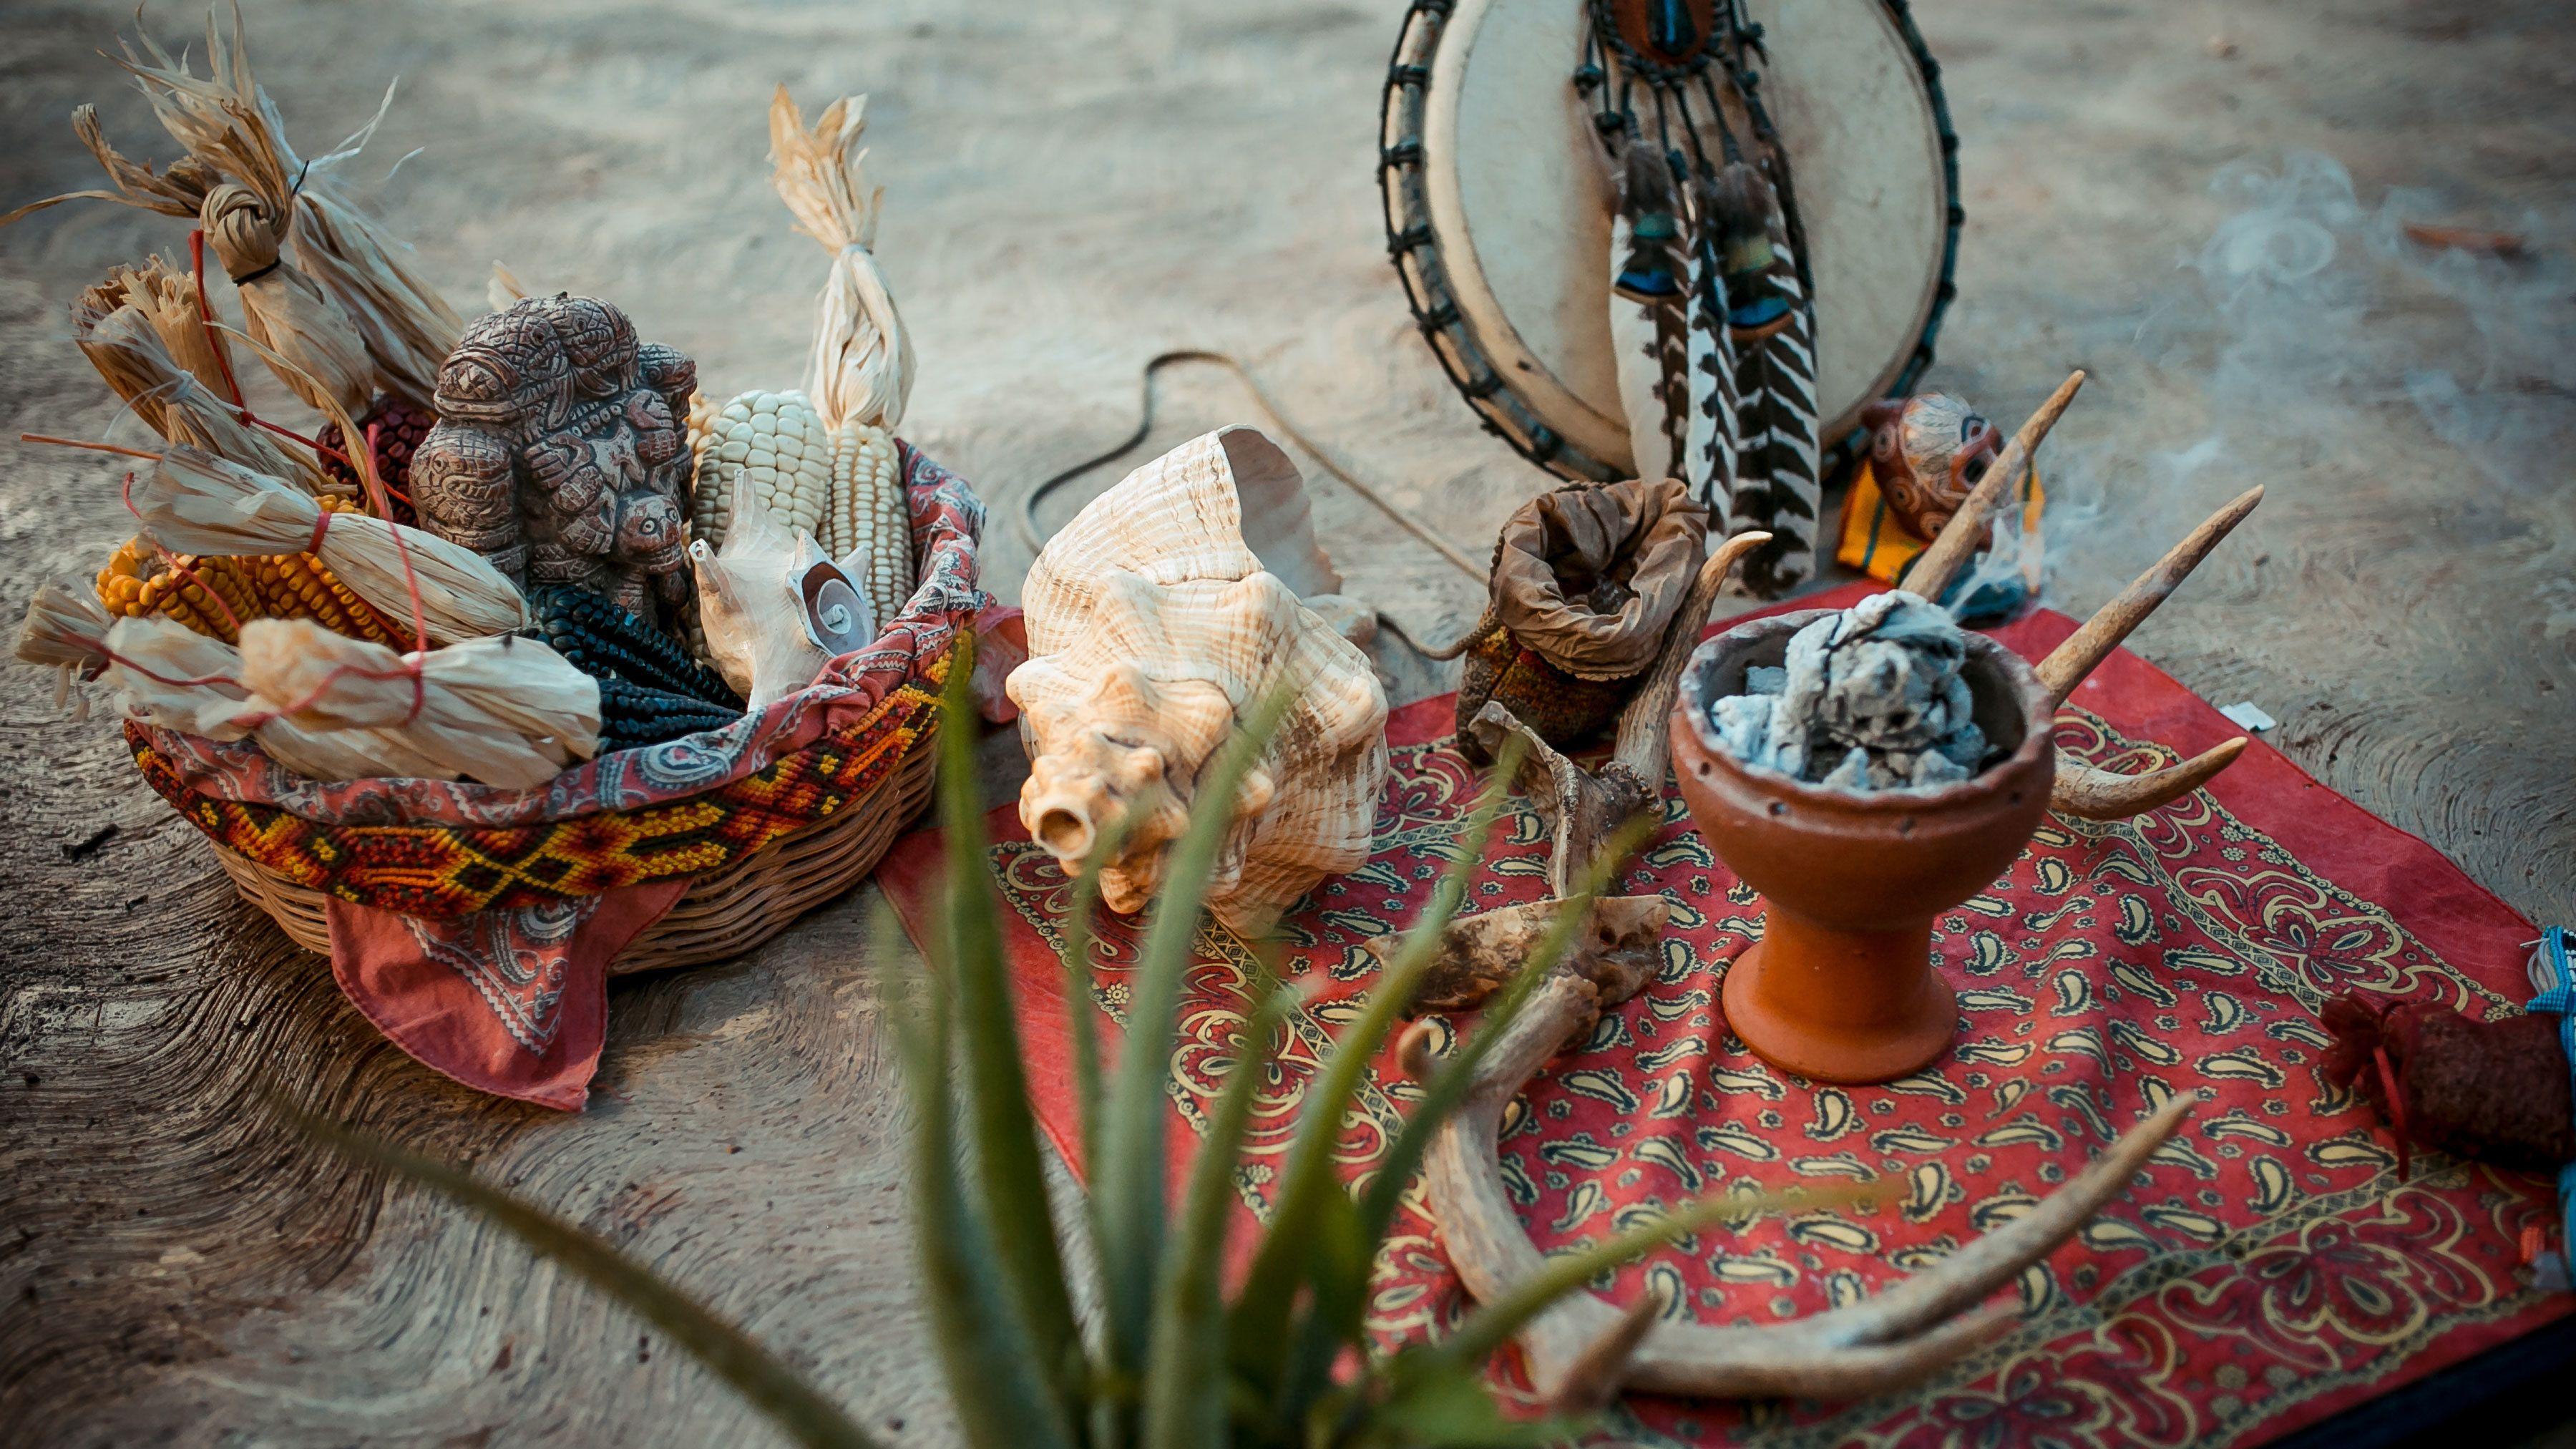 Items used in Temazcal Ritual